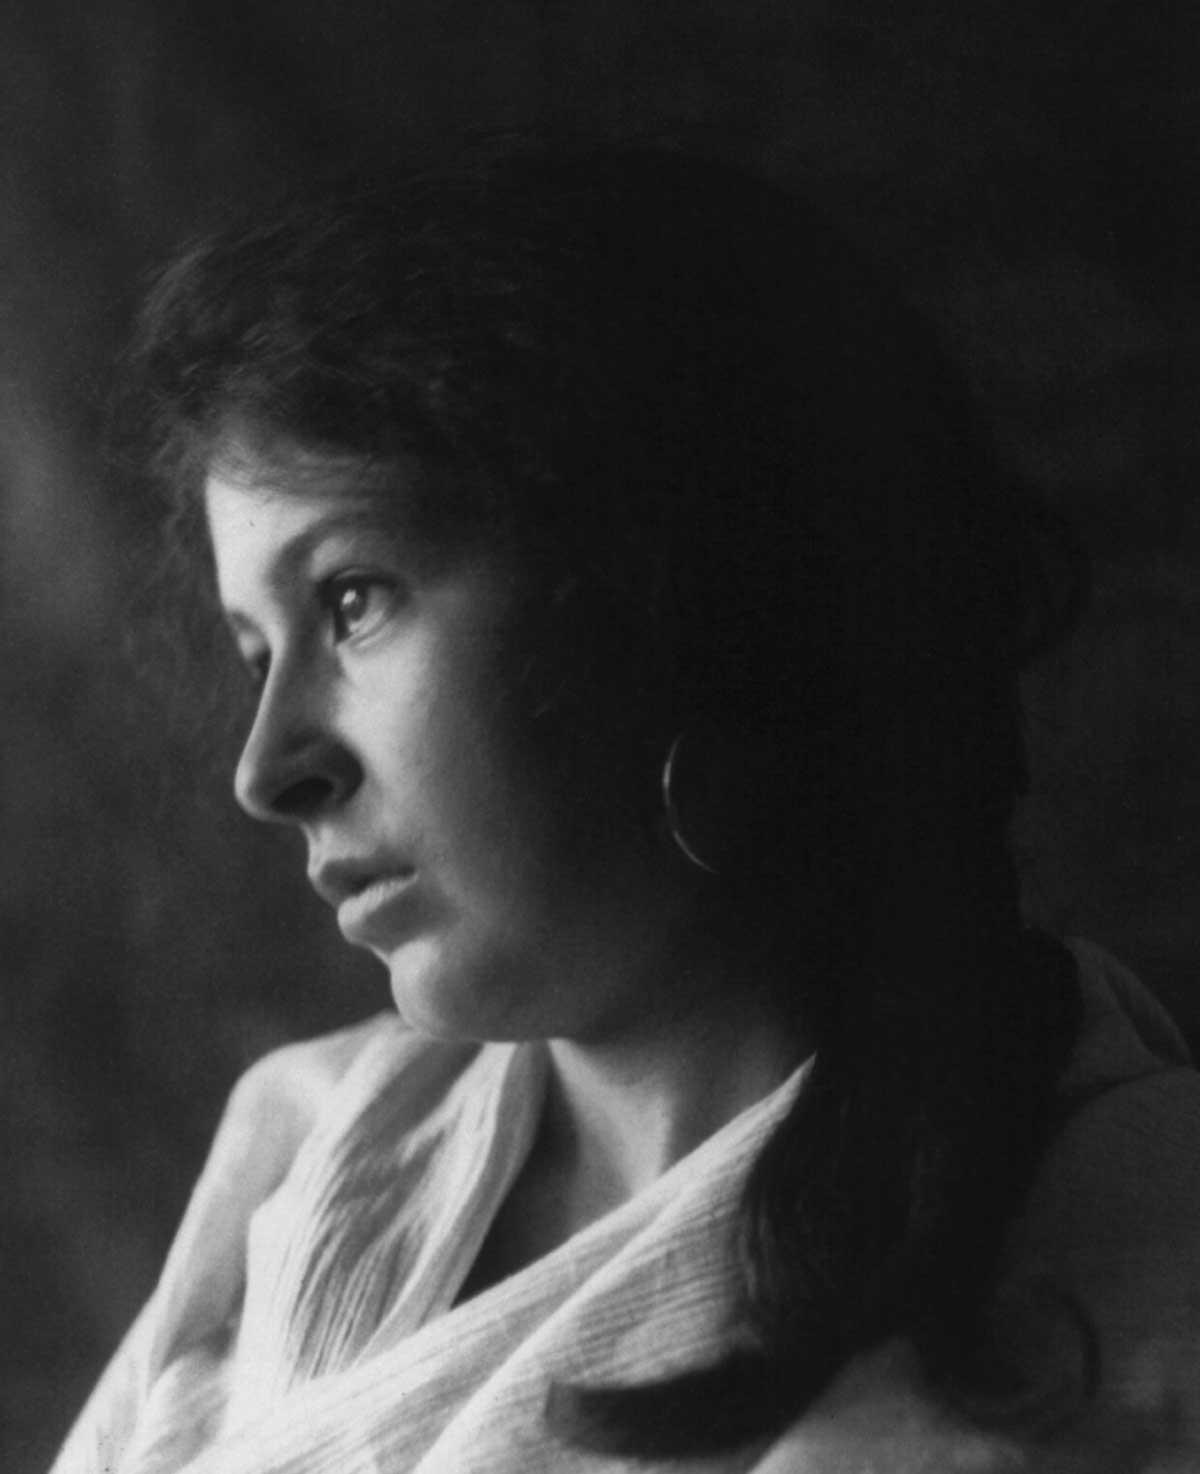 c. 1898: Woman in drapery with hoop earrings